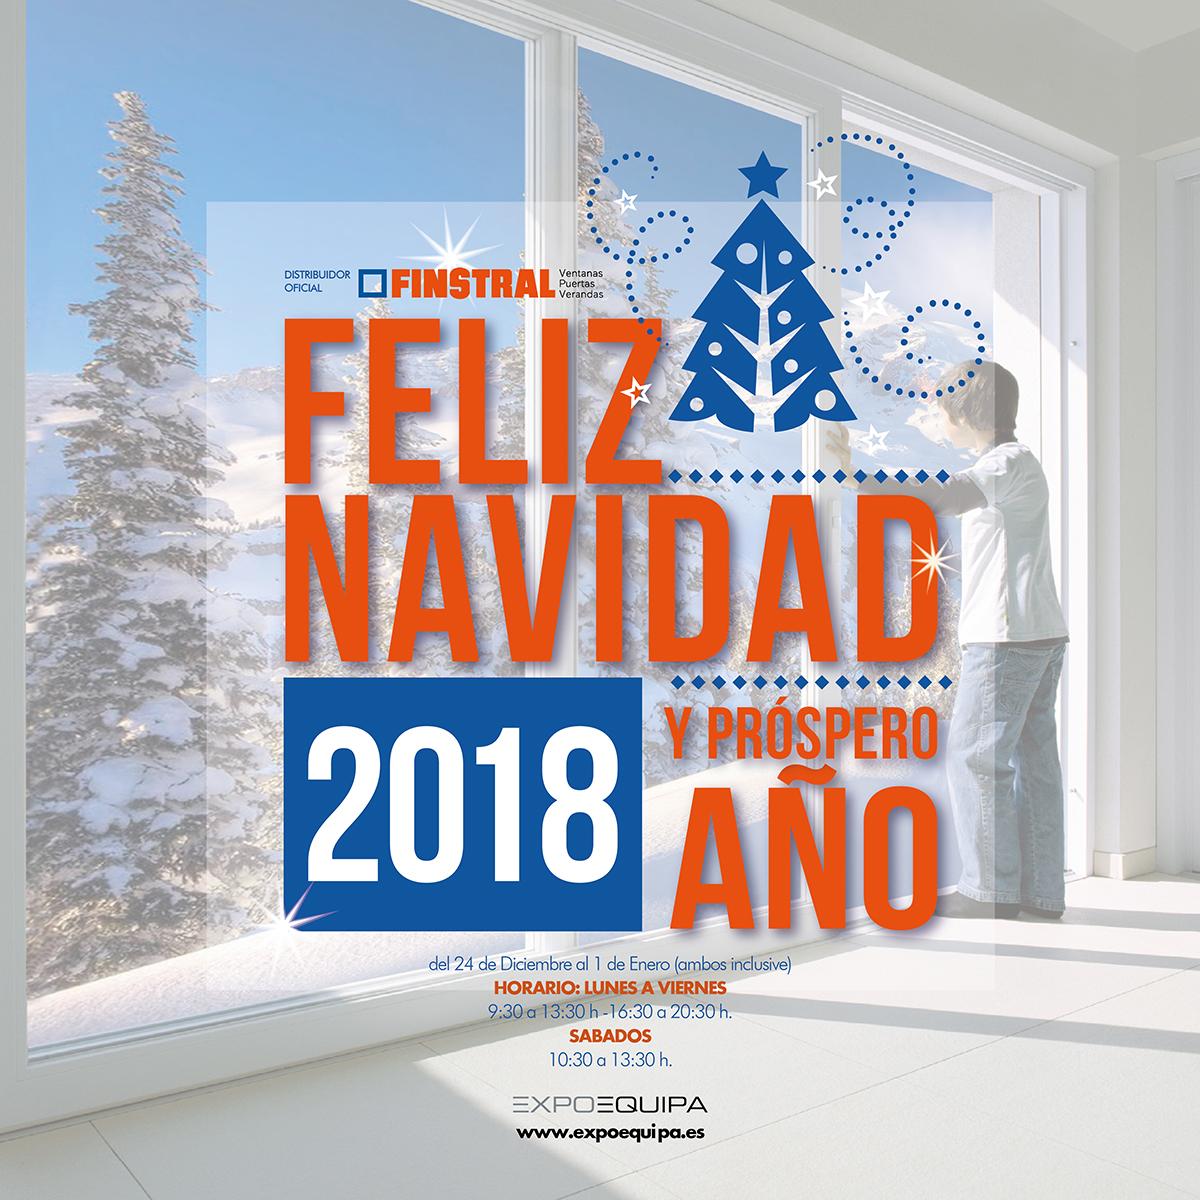 Feliz navidad 2018